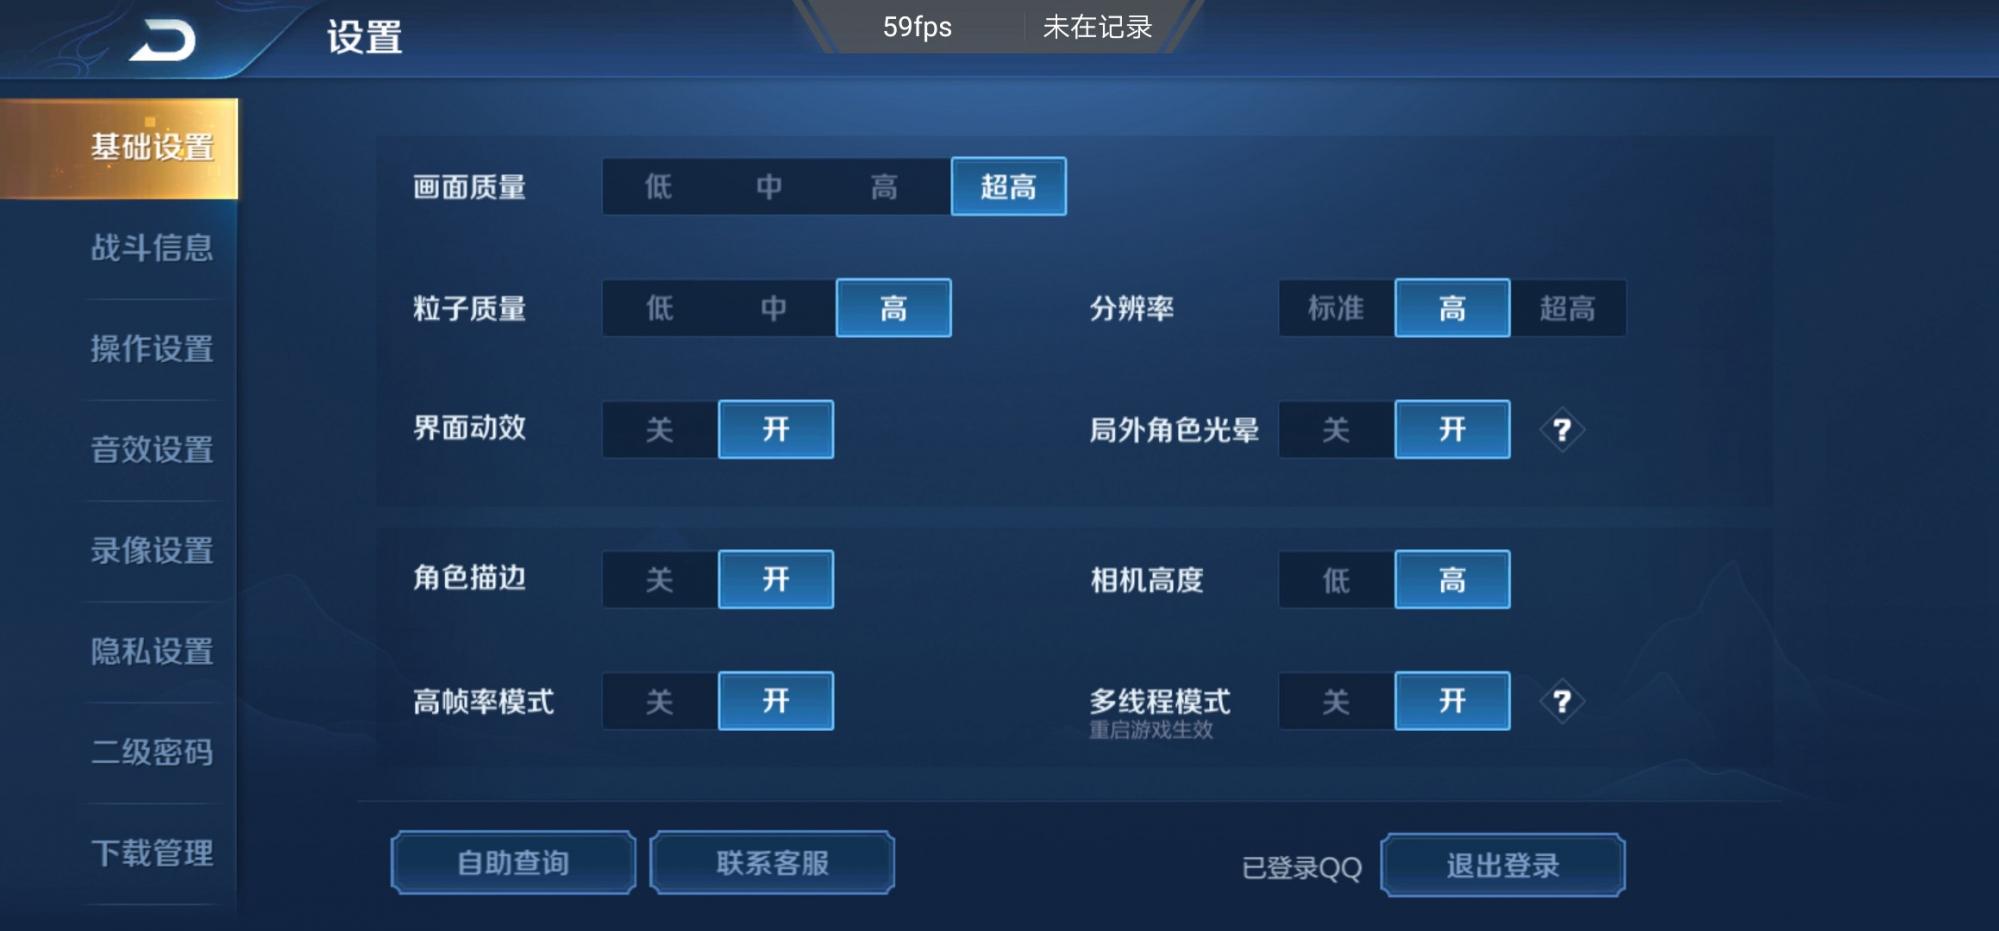 Screenshot_20191020_150105_com.tencent.tmgp.sgame.jpg